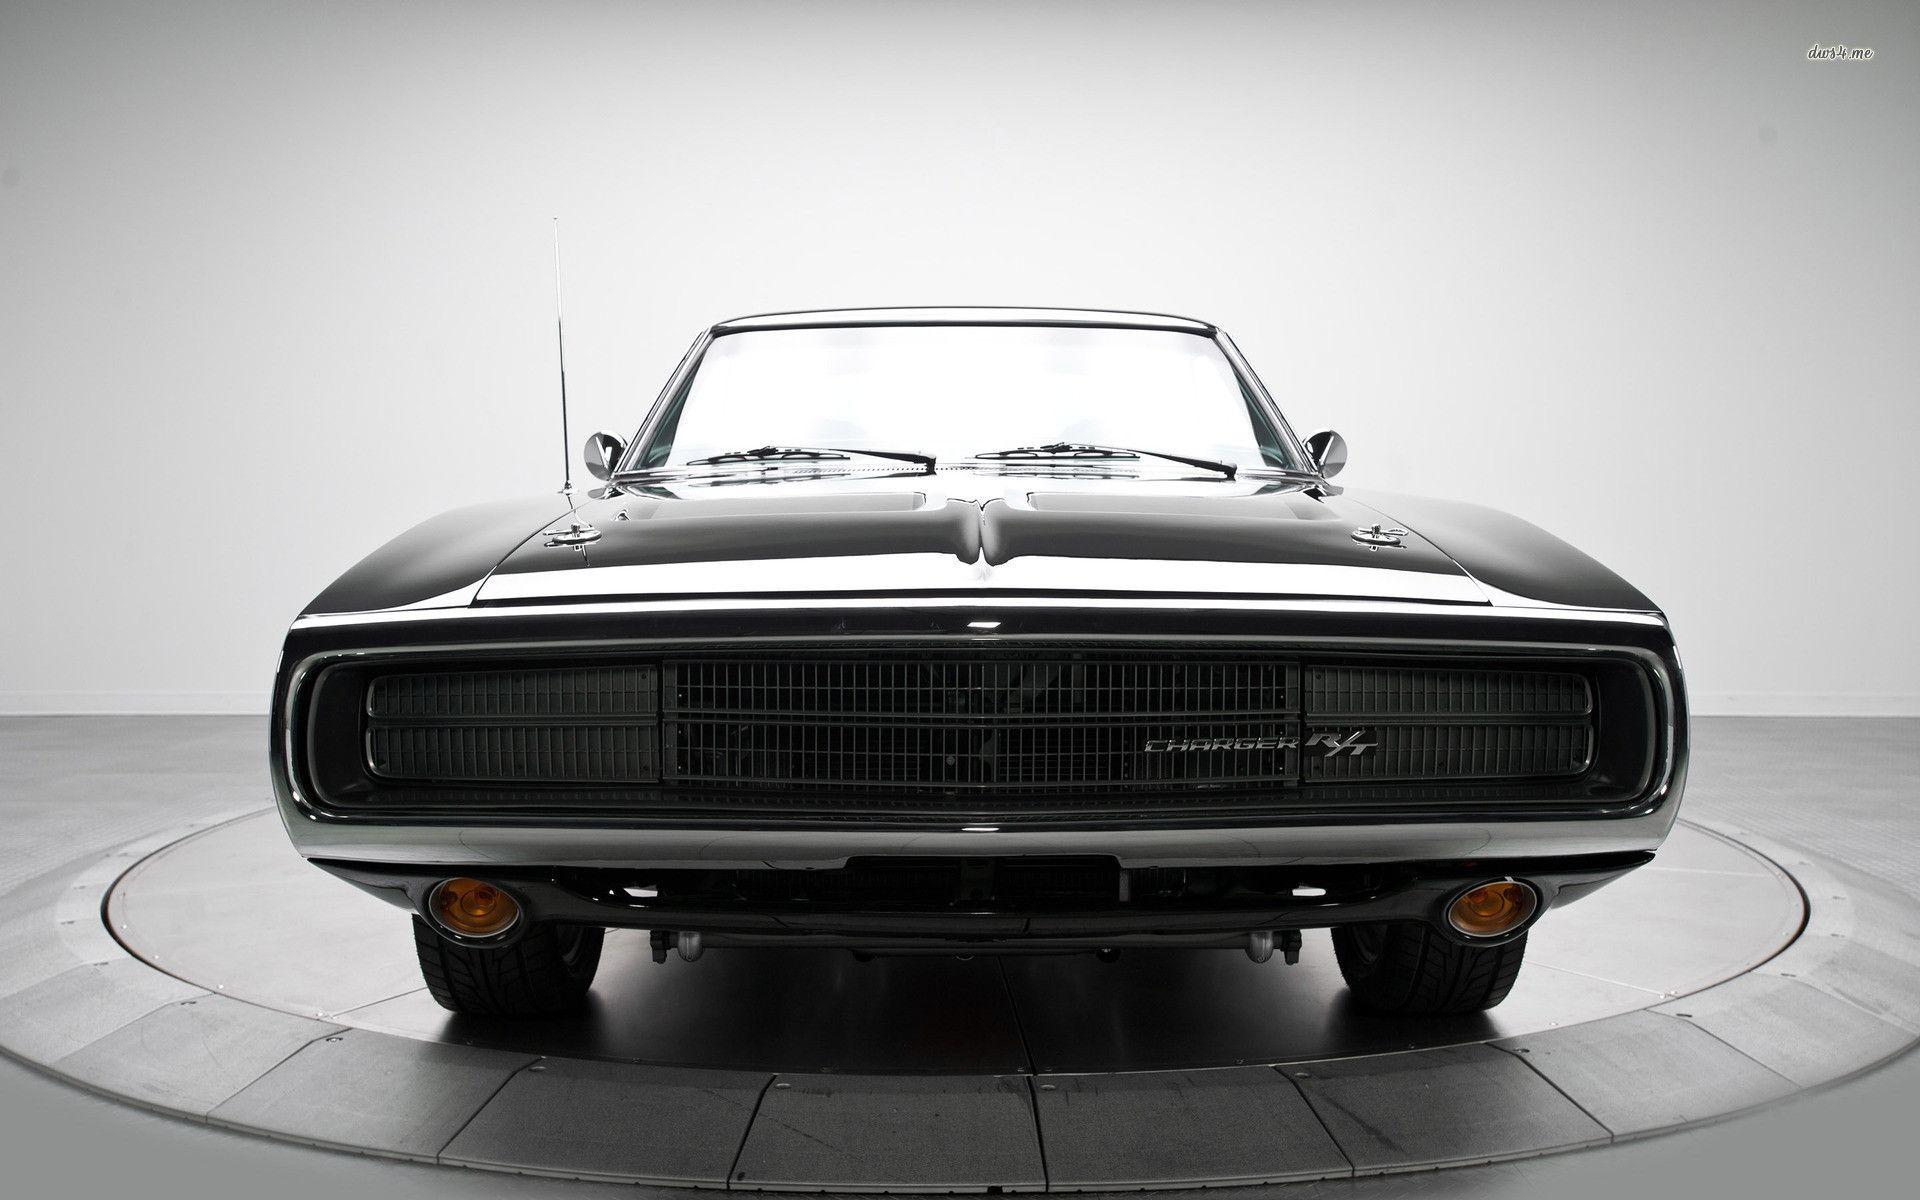 Dodge Charger HD Обои Фоны Wallpaper